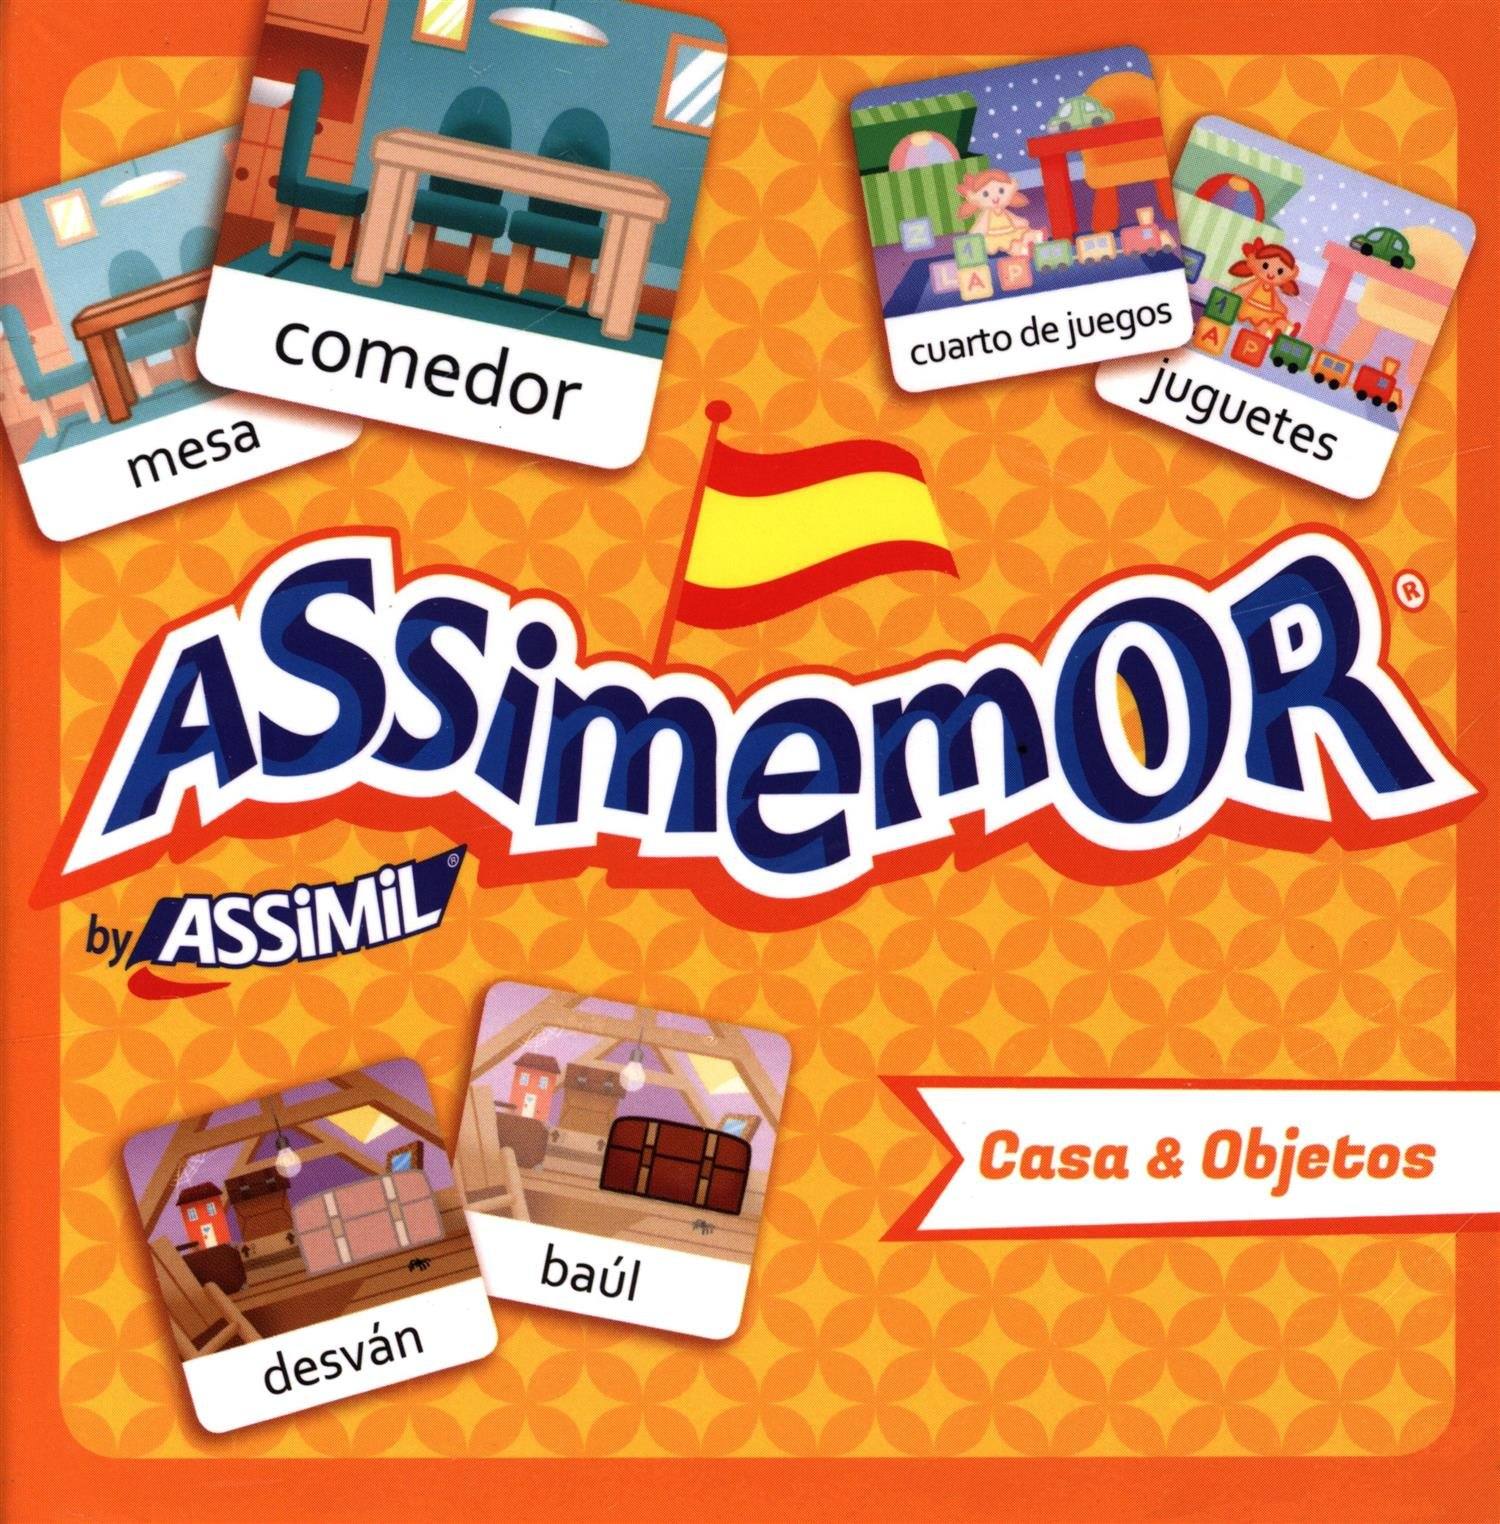 Assimemor Casa & Objetos Cartonné – 22 septembre 2016 Collectif Assimil 270059049X Età: a partire dai 5 anni